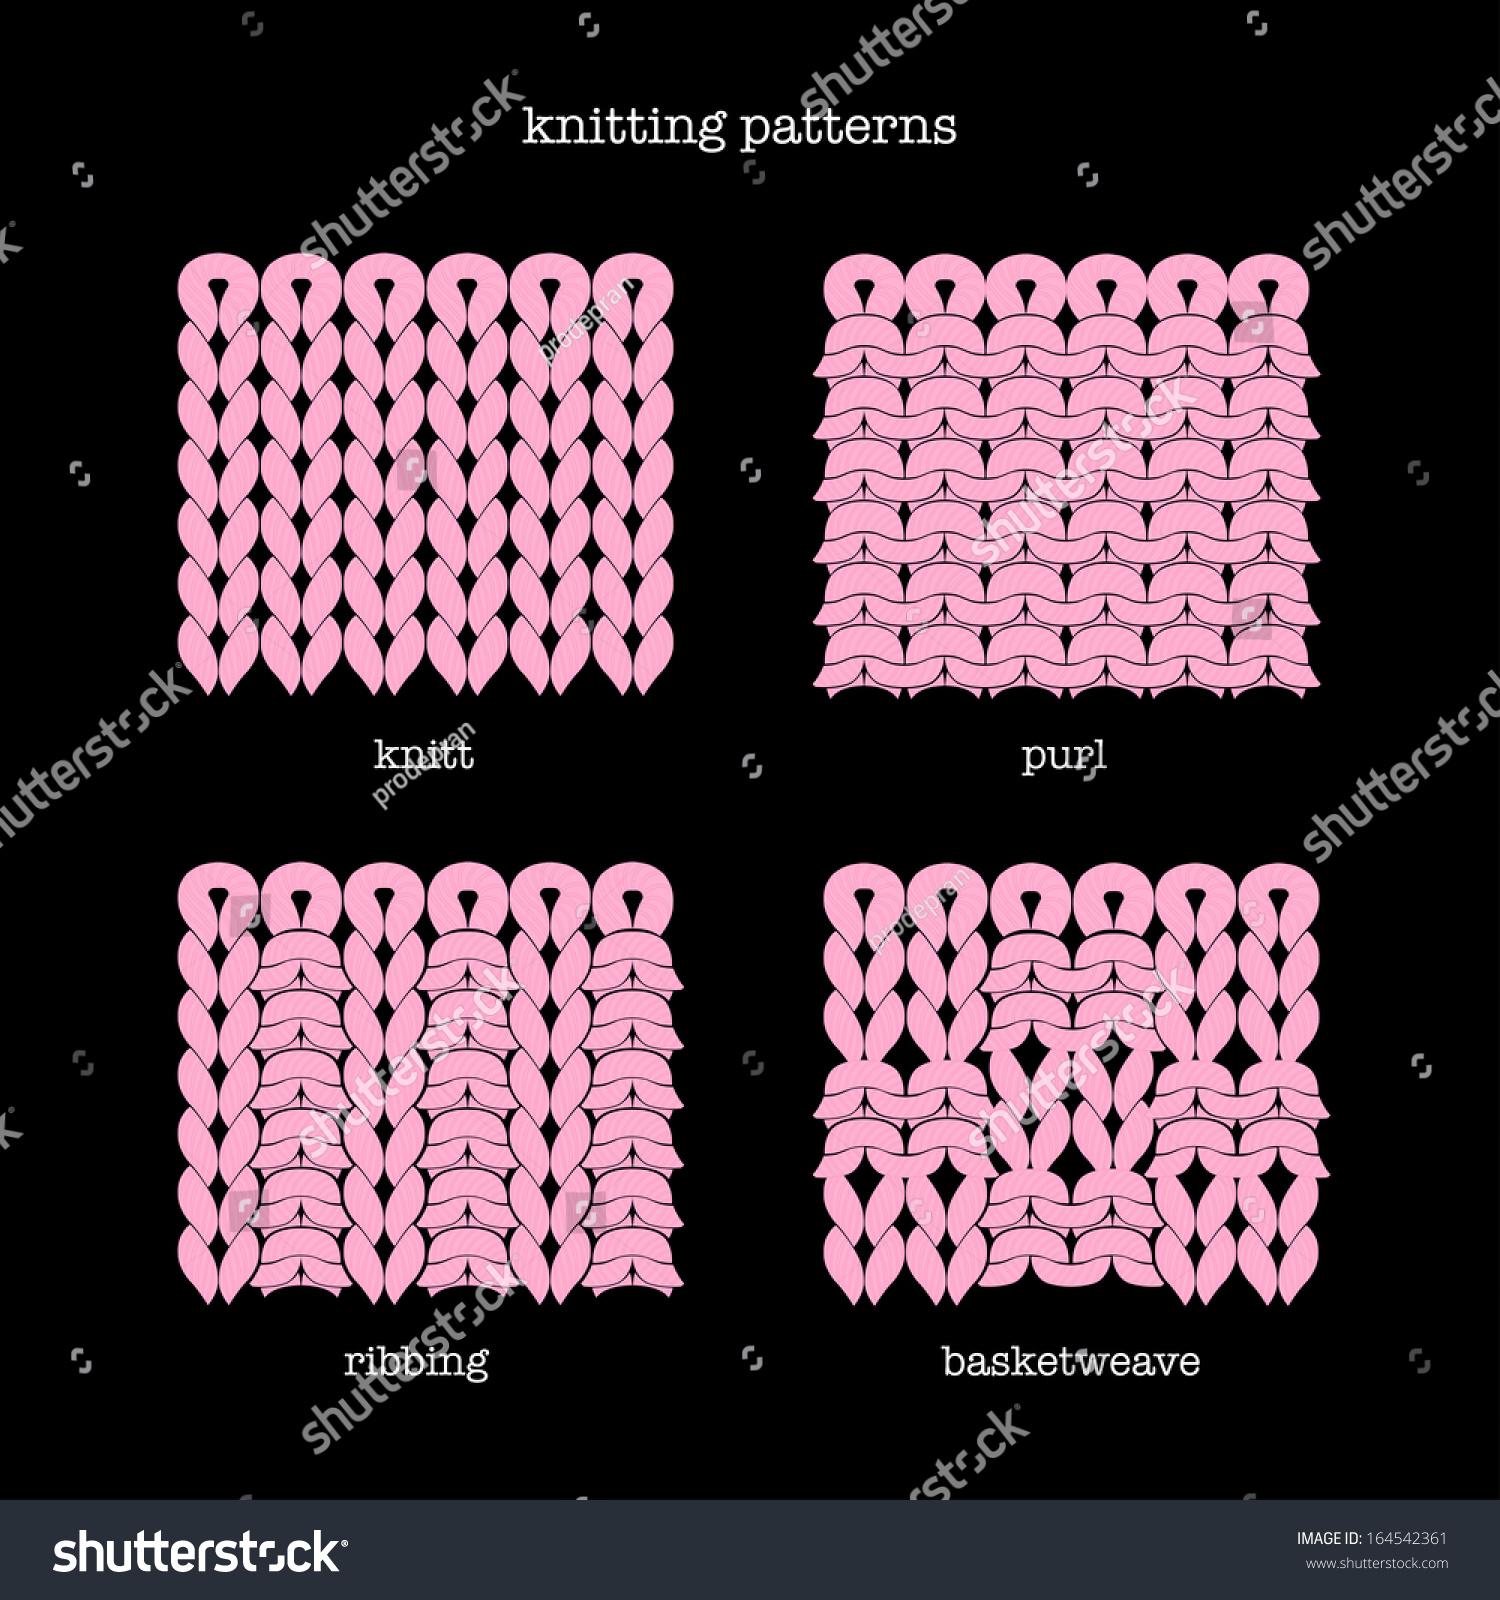 Knitting Stitches Vector : Knitting Patterns Stock Vector Illustration 164542361 : Shutterstock